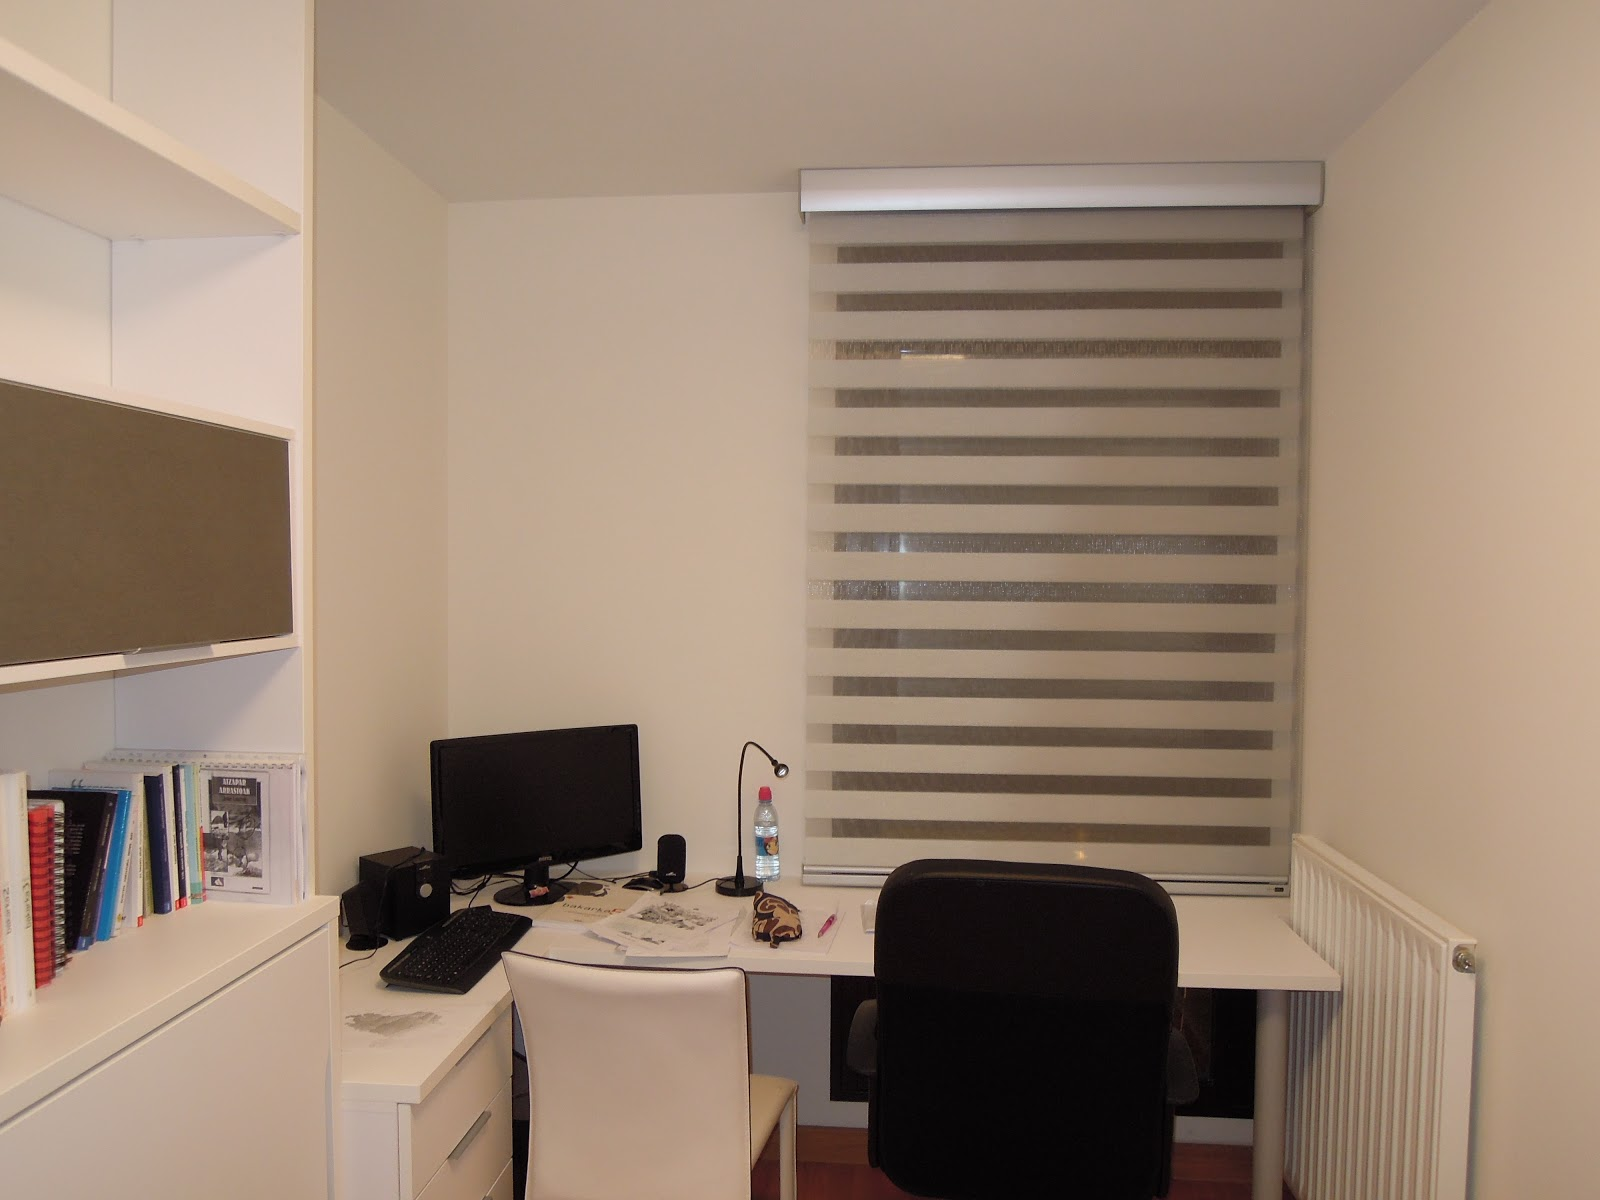 Fotos de cortinas dormitorio juvenil 2012 for Cortinas dormitorio moderno